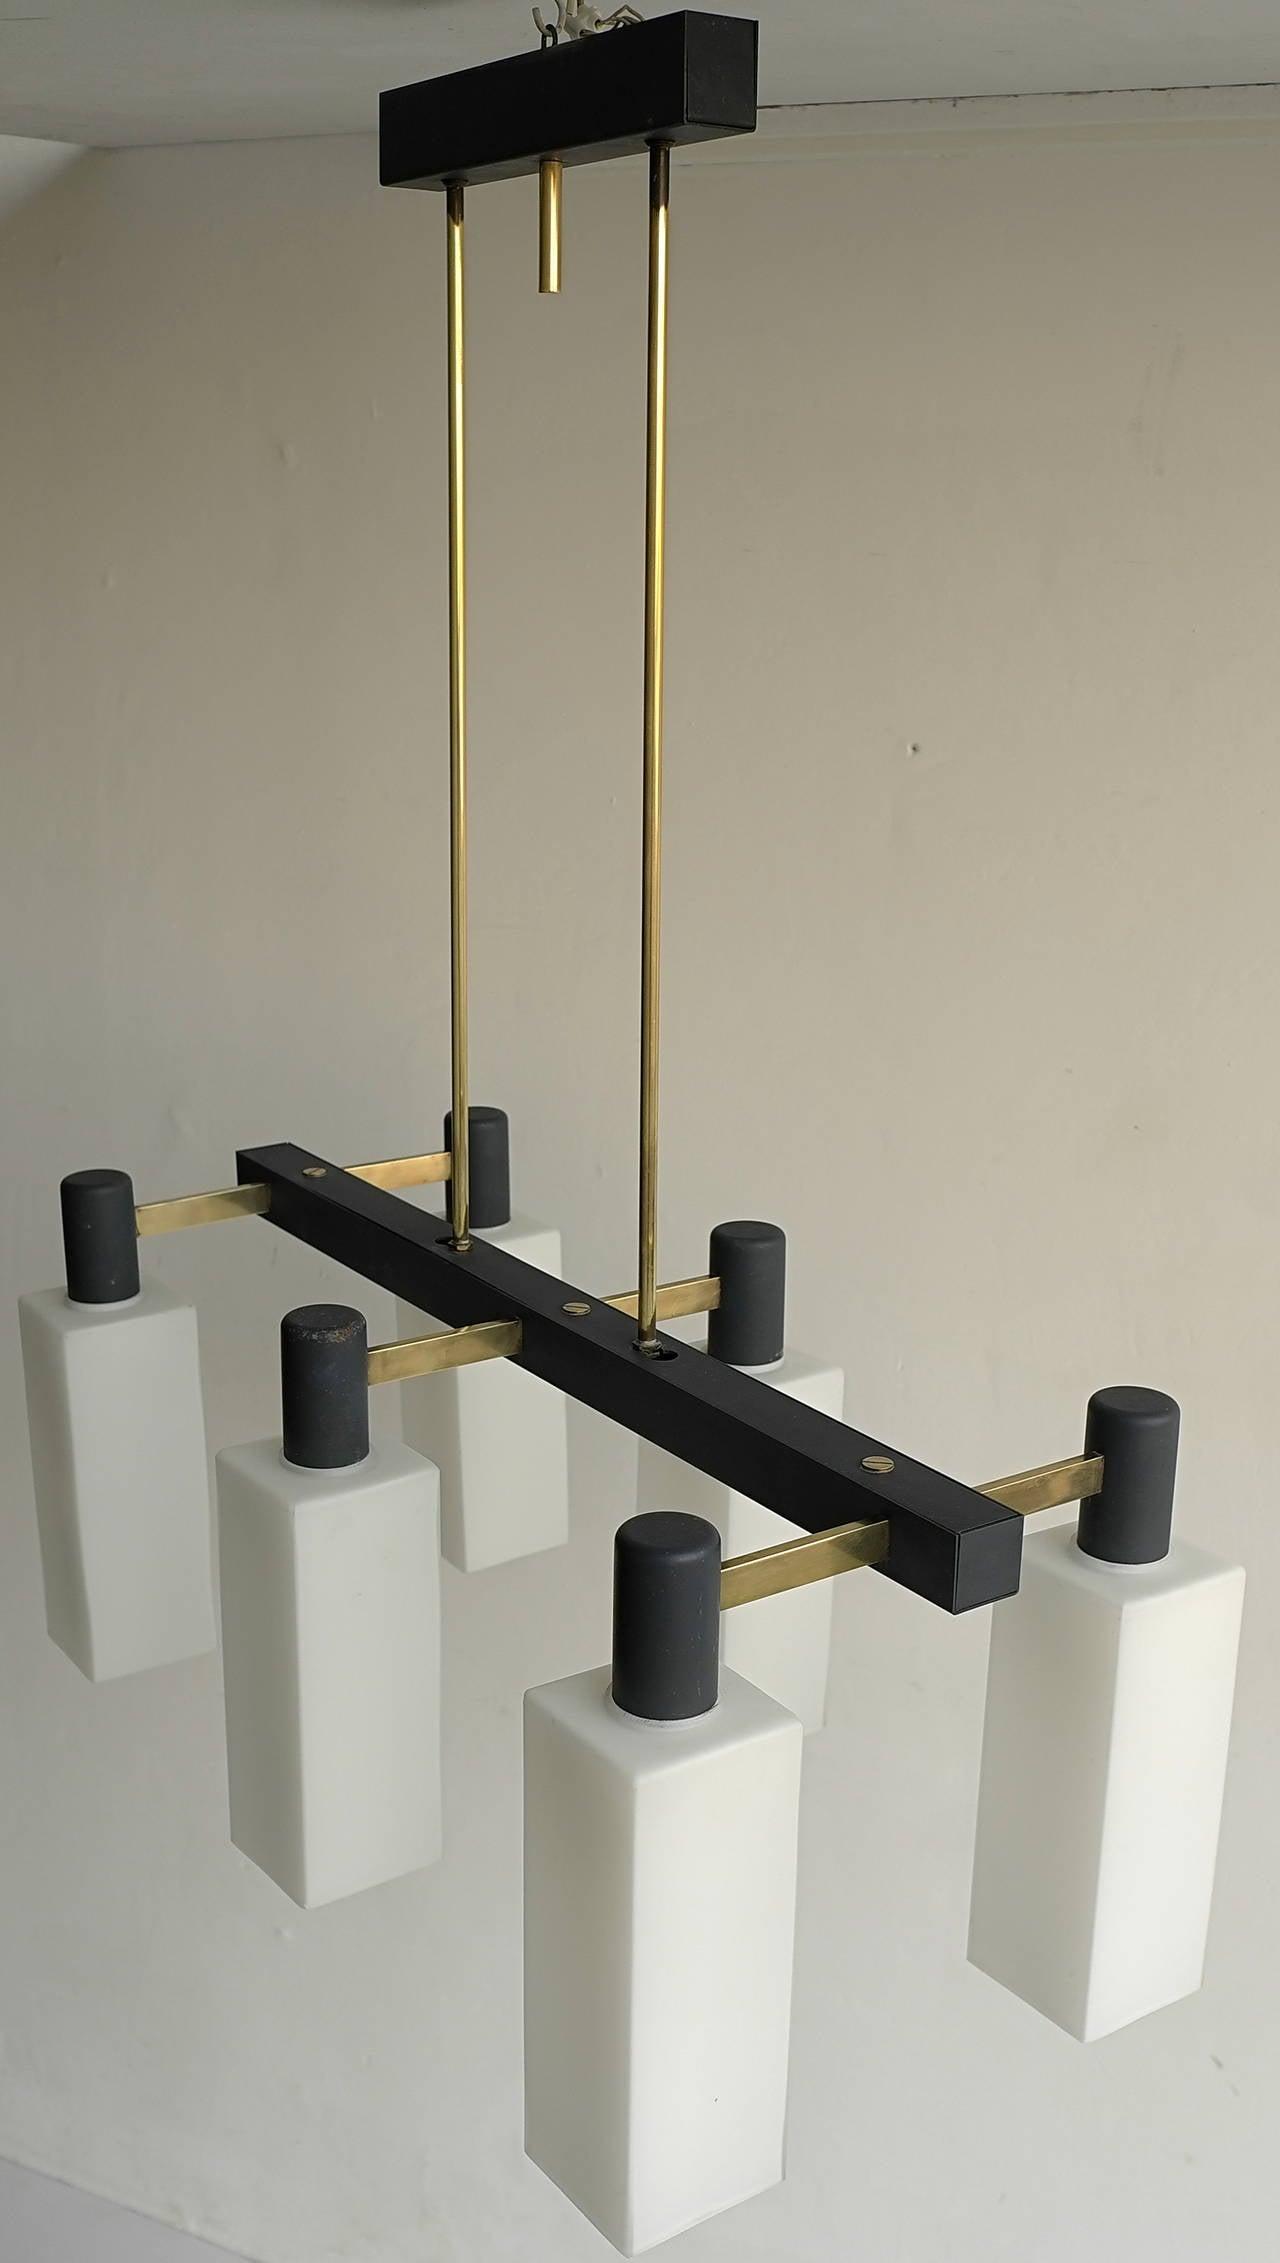 Mid-20th Century Italian Monumental Pendant Lamp, 1960s For Sale